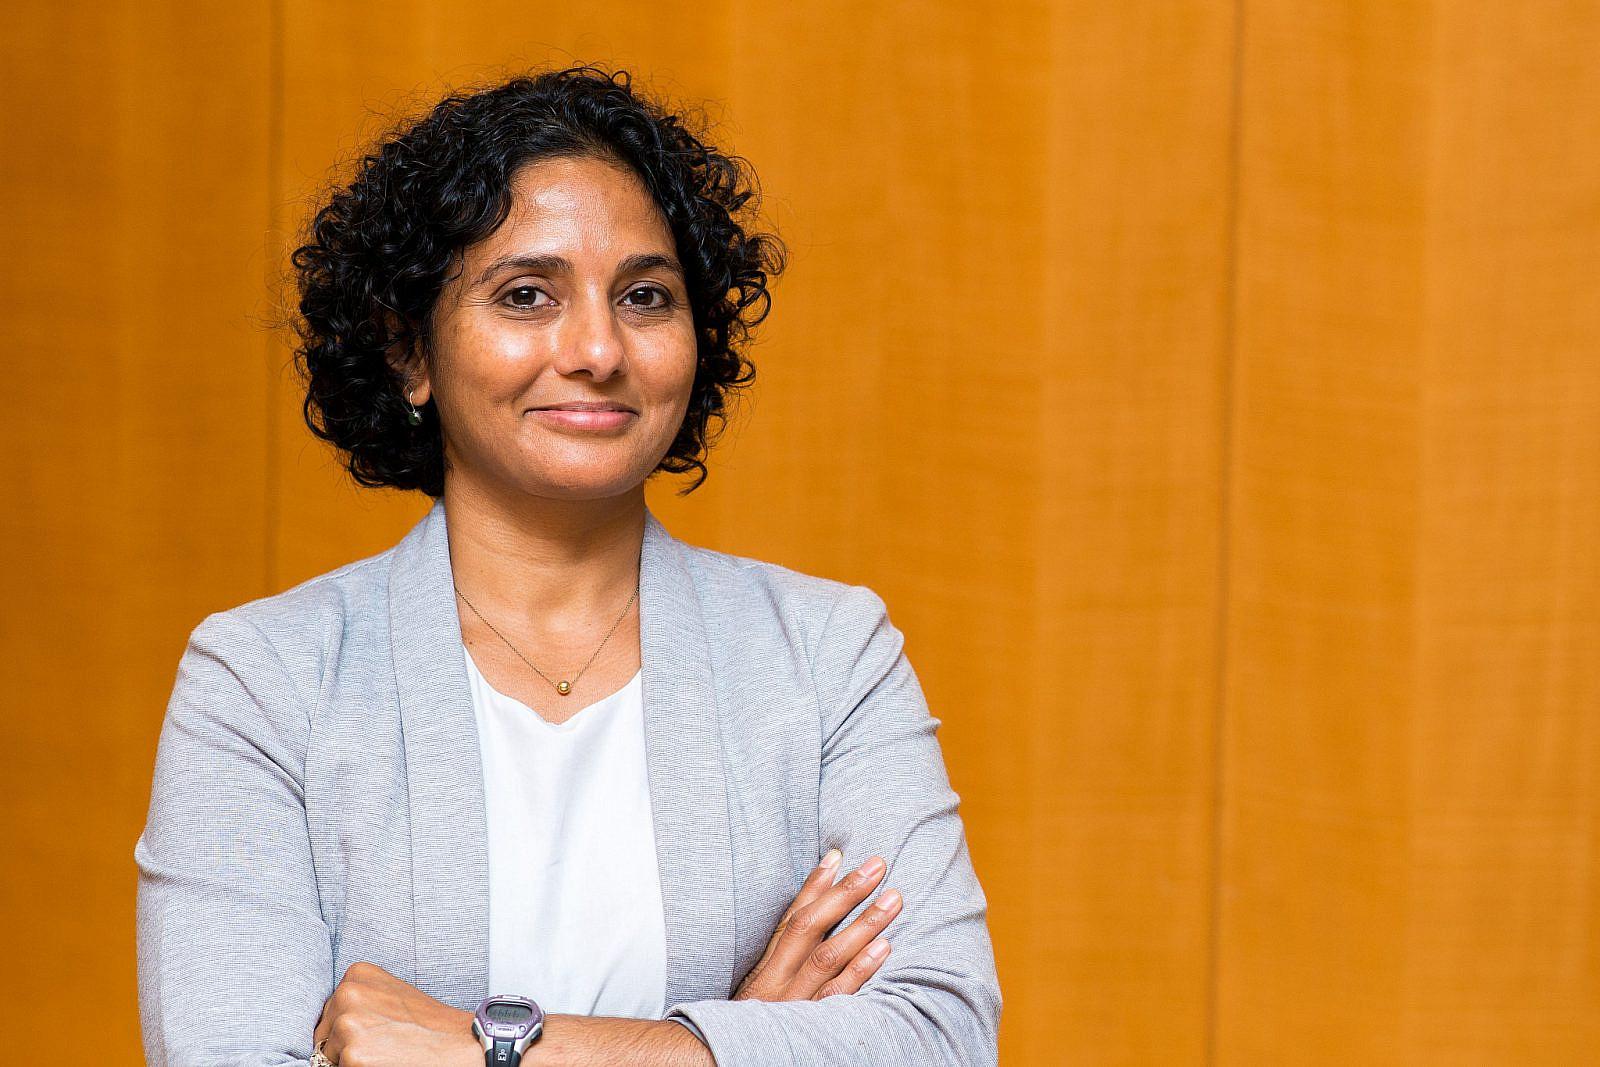 Meera Shah, senior staff attorney at Palestine Legal. (Courtesy of Palestine Legal)